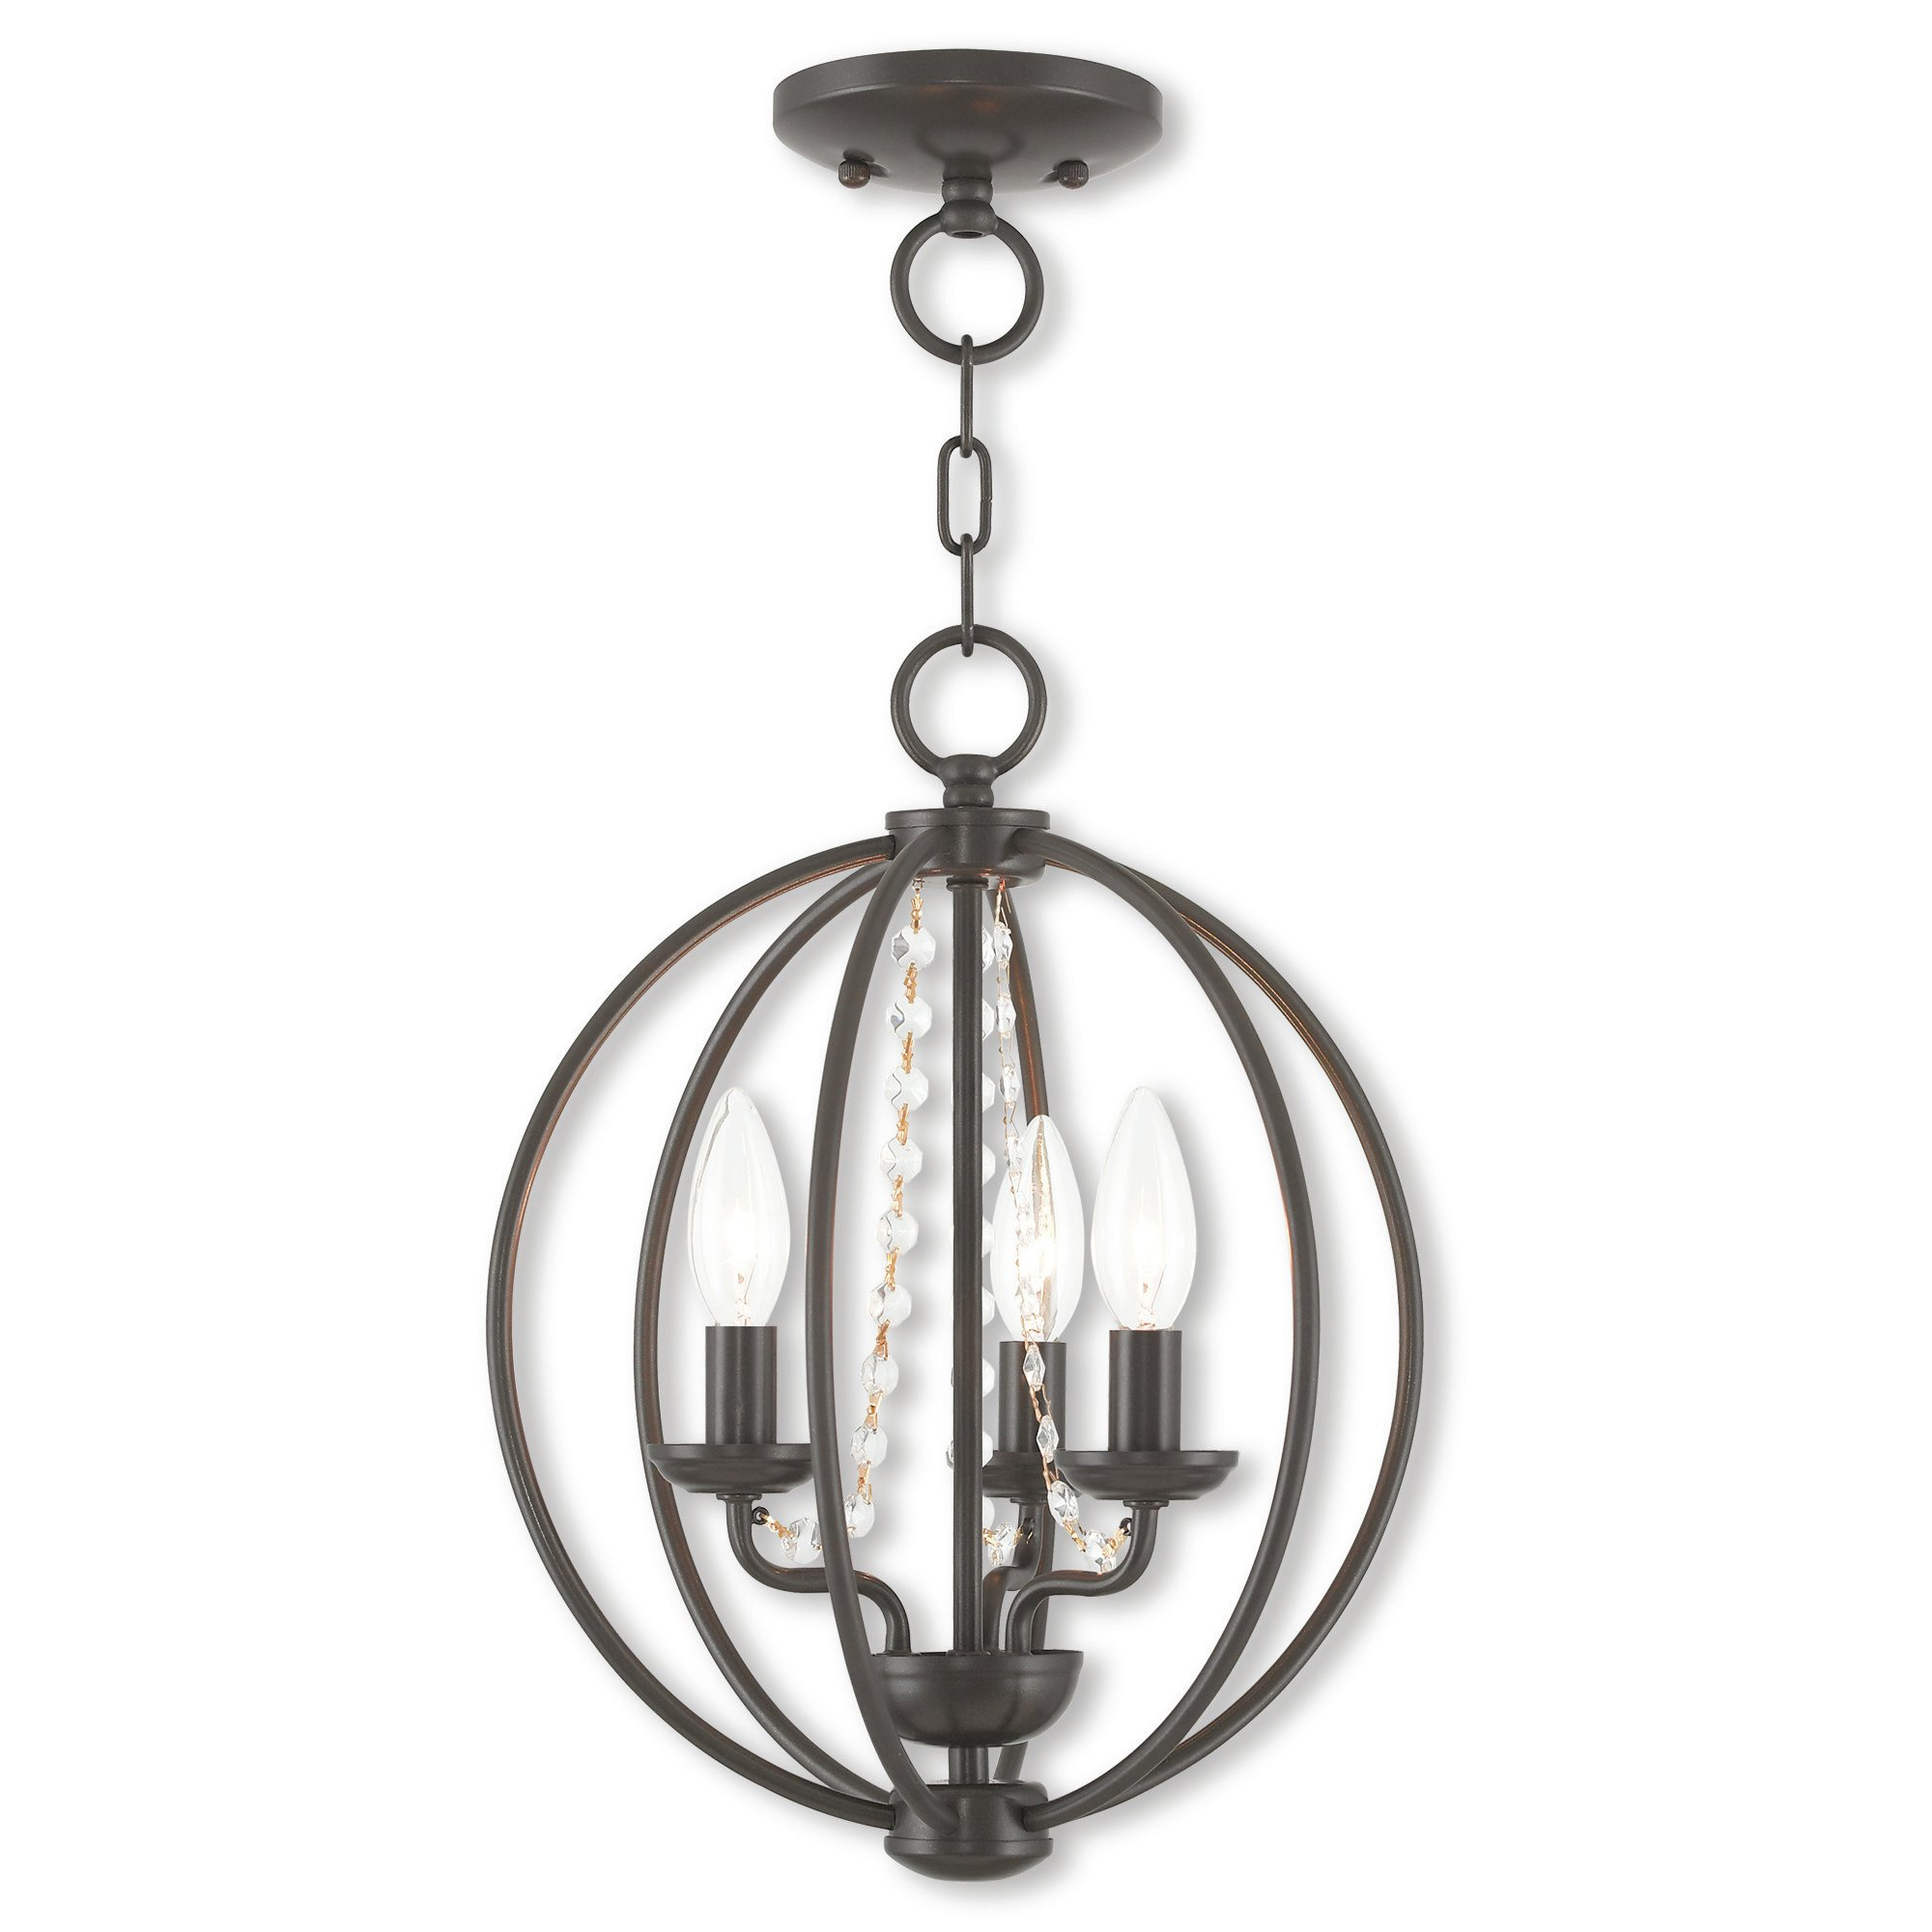 Artus 3 Light Globe Chandelier With Regard To Dirksen 3 Light Single Cylinder Chandeliers (View 5 of 30)